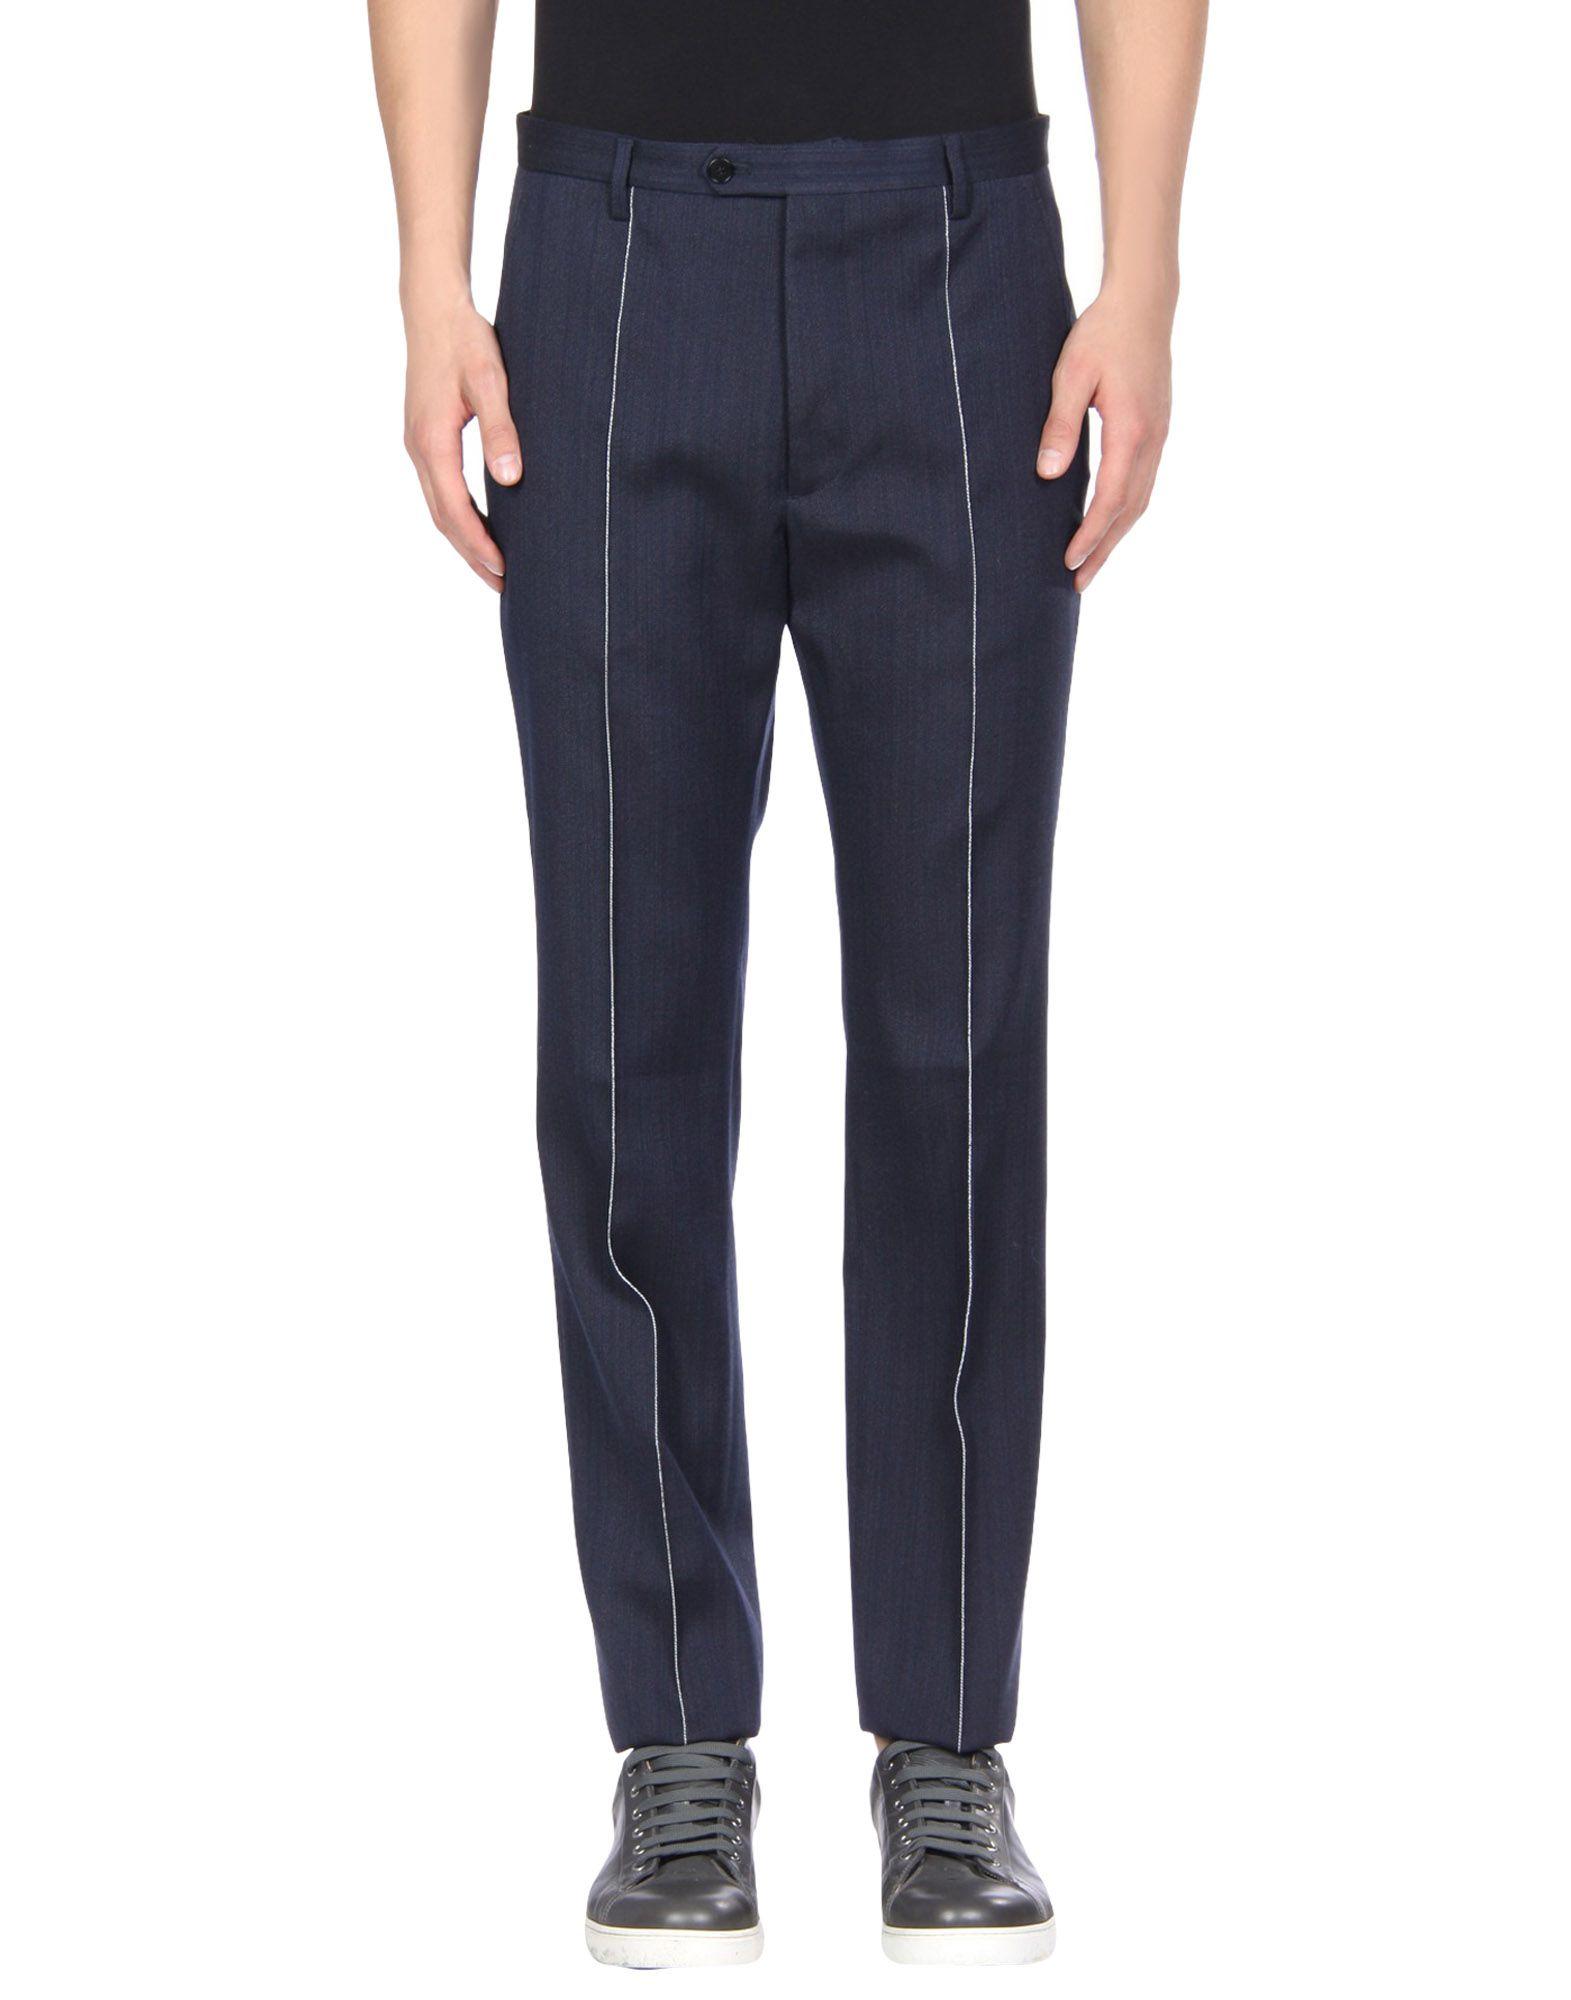 Pantalone Maison Margiela Donna - Acquista online su